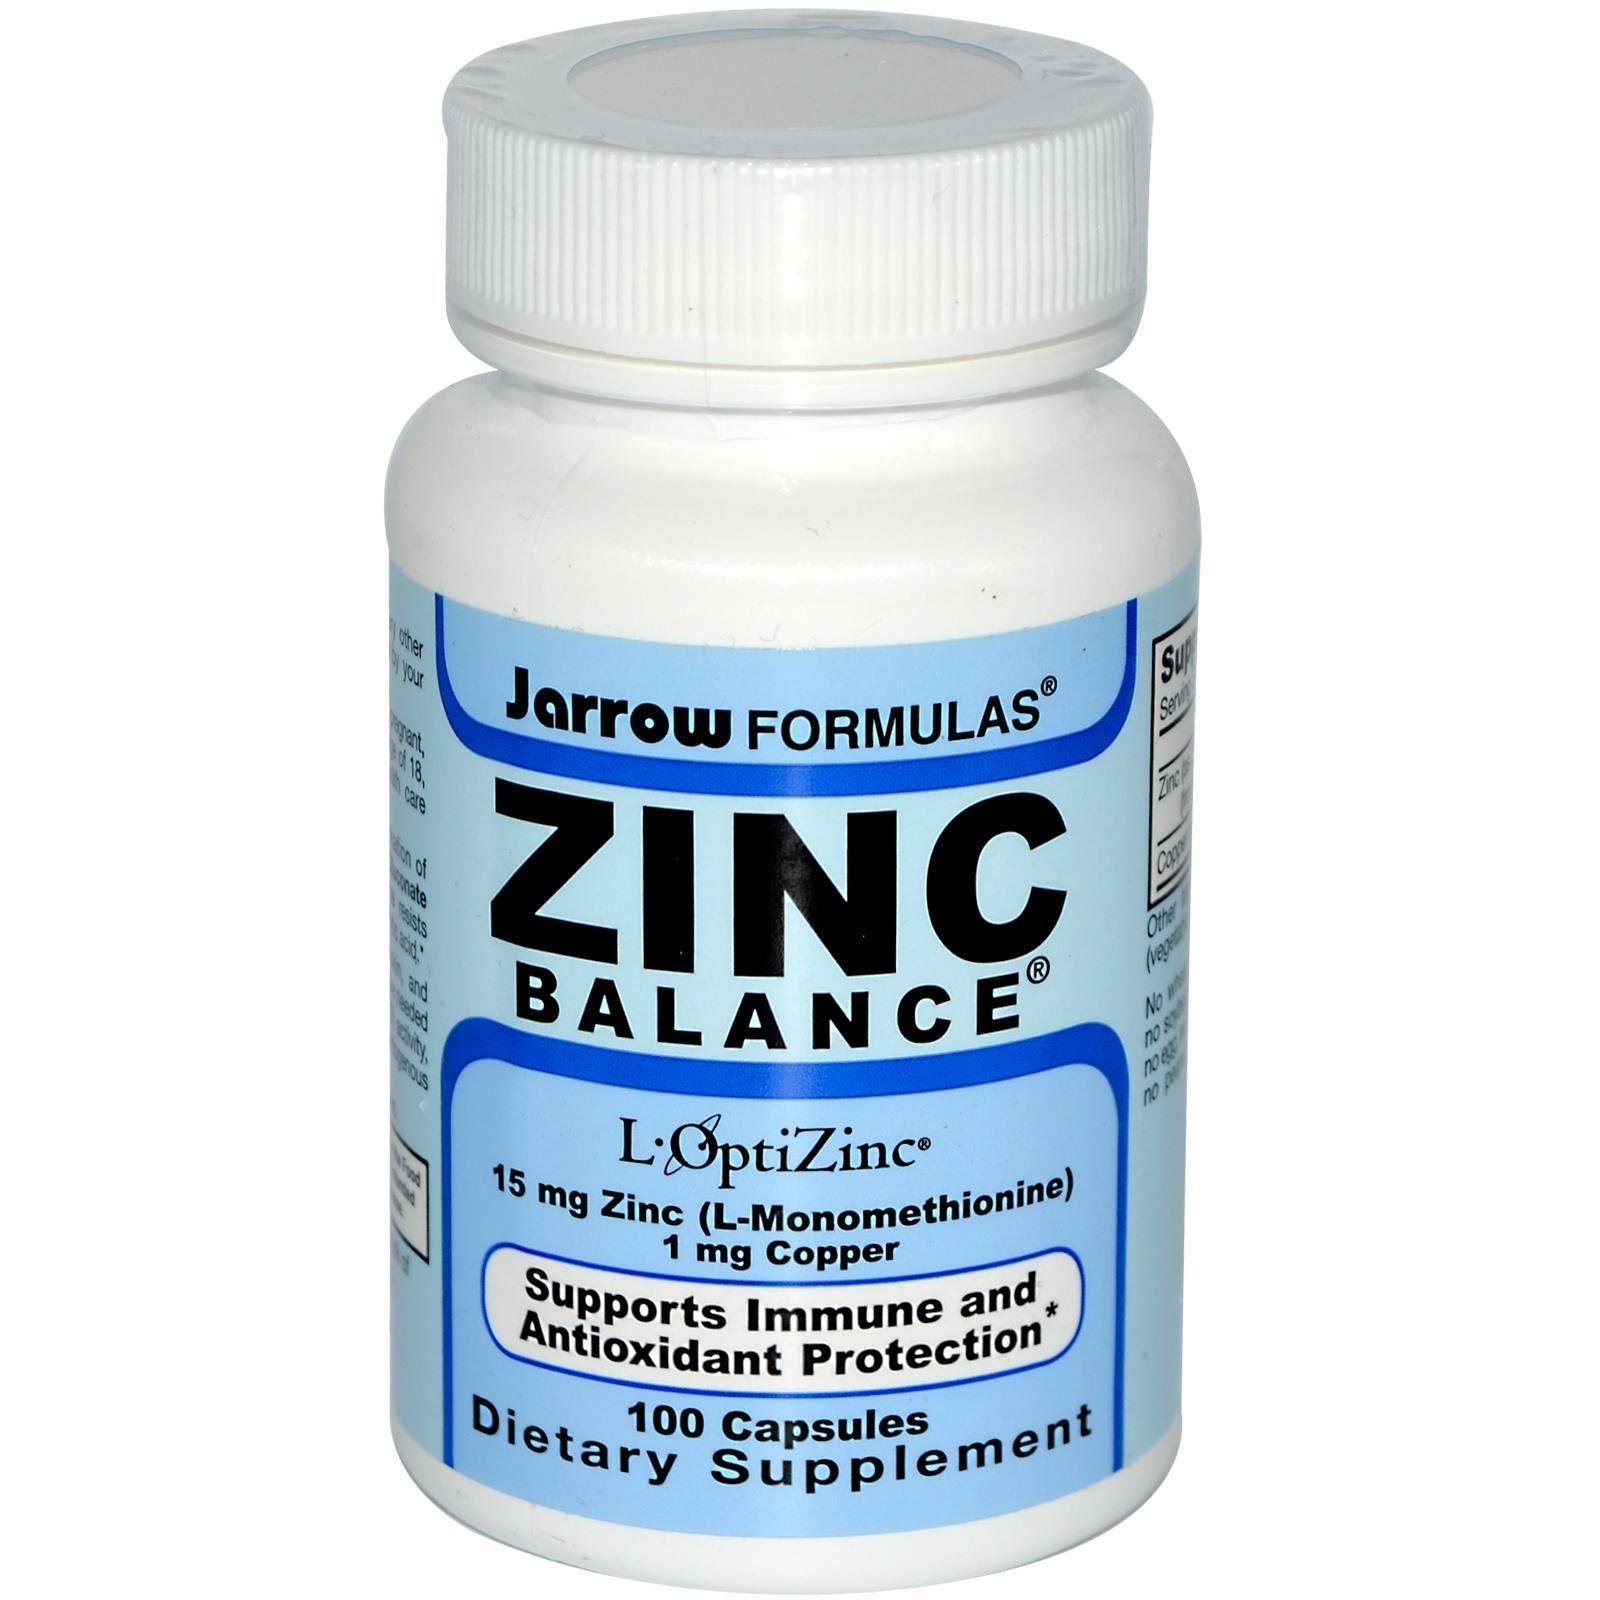 Jarrow Formulas Zinc Balance 100 Veggie Caps Veggie Caps Dietary Supplements Dietary